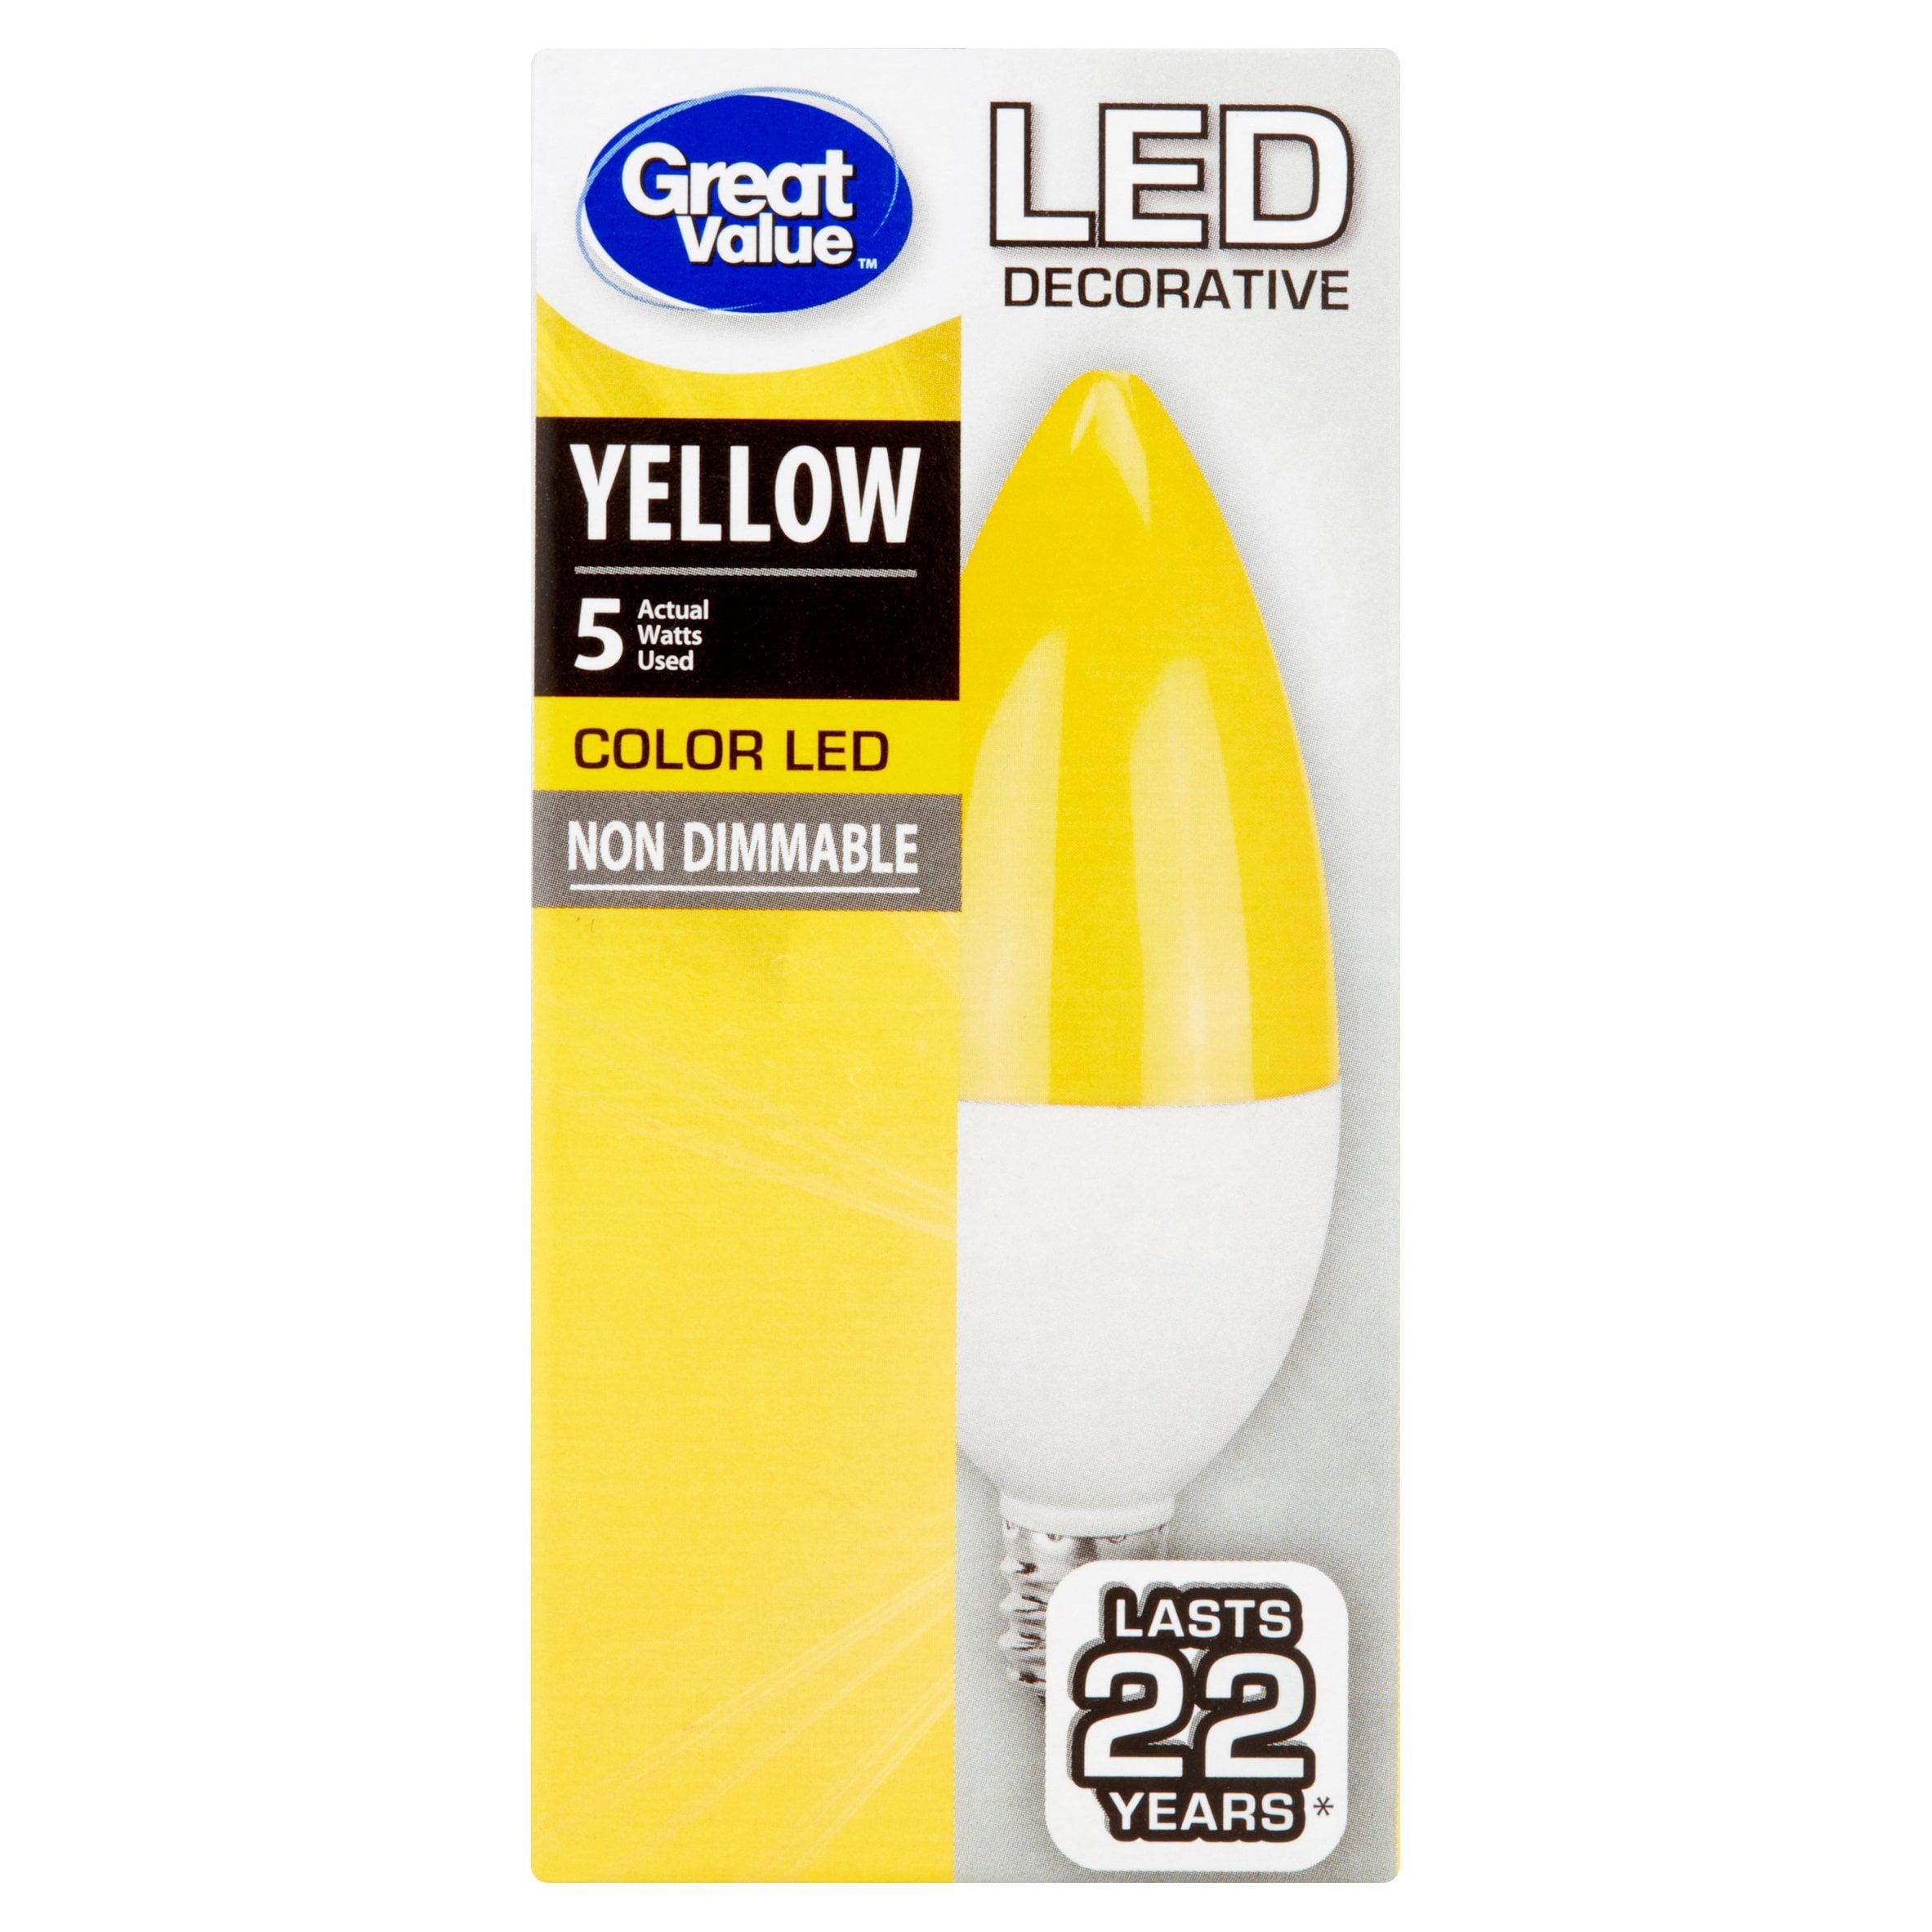 Great Value Color LED Decorative (E12) Light Bulb, 5 Watt, Yellow